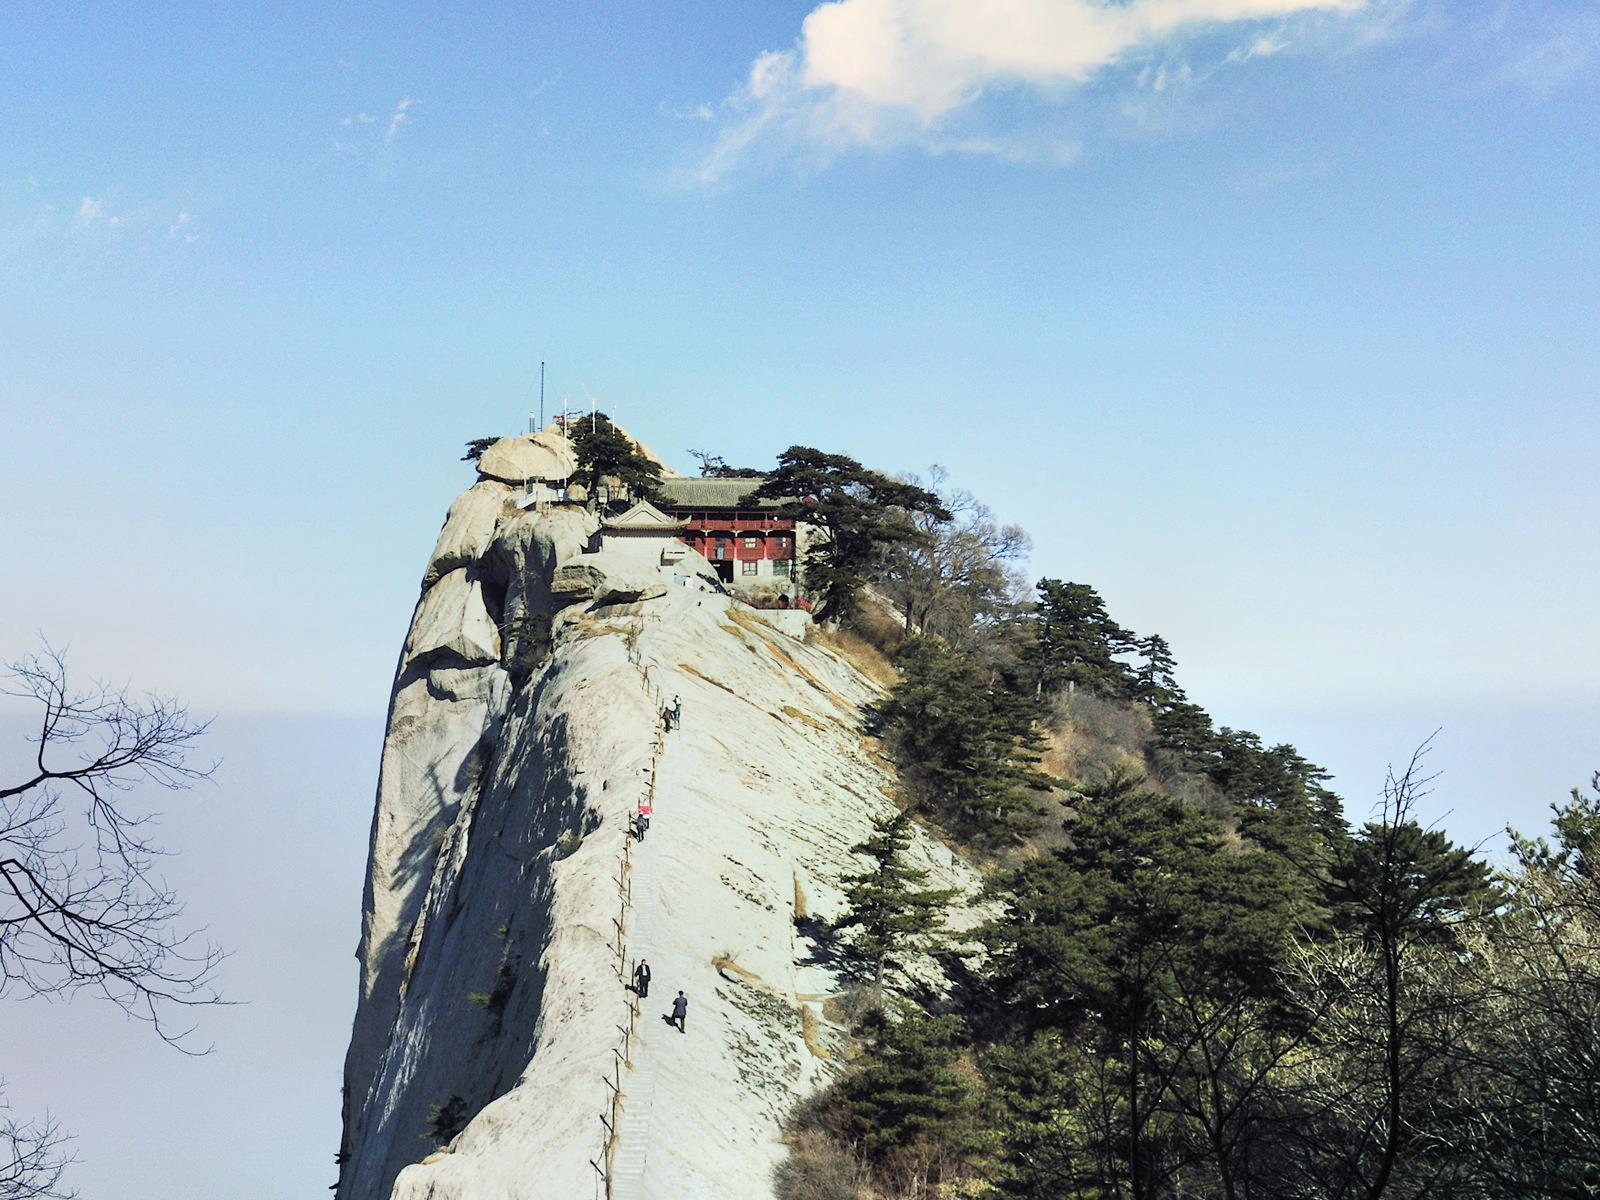 Xifeng